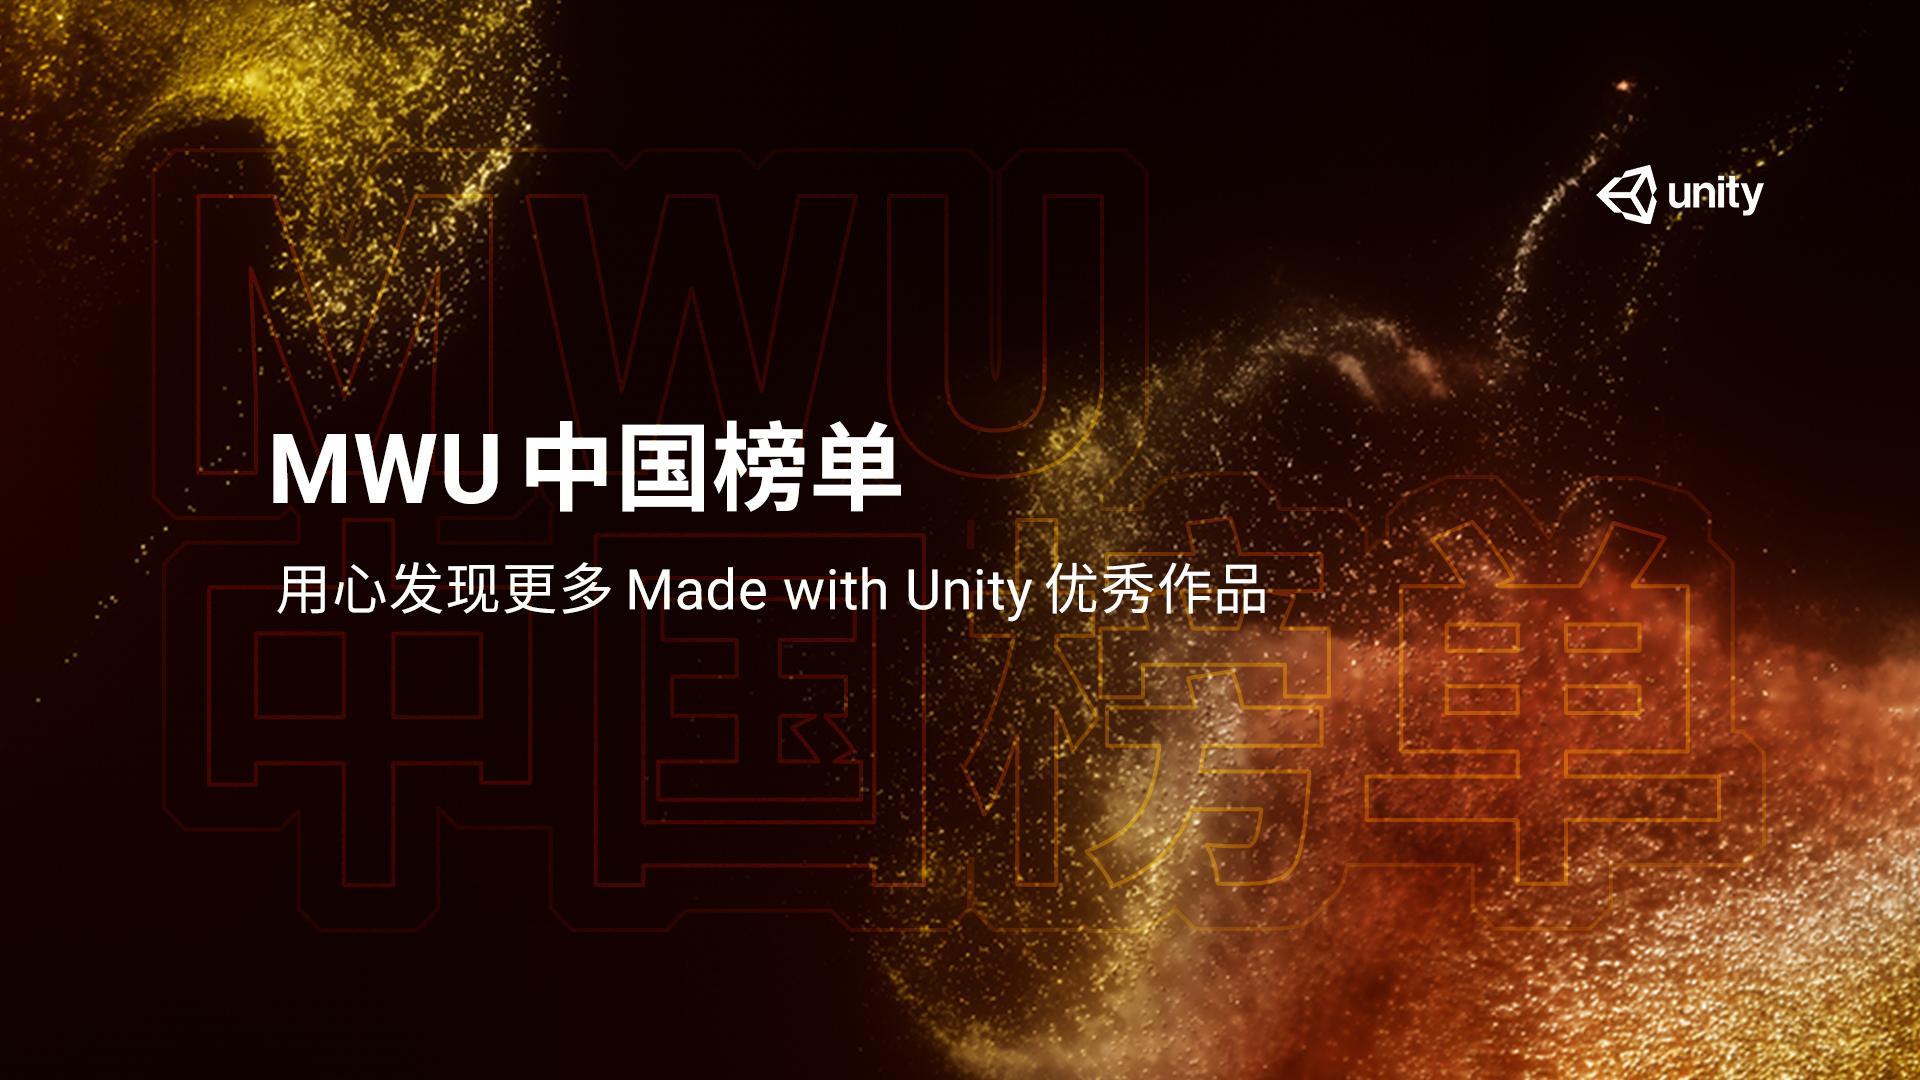 Unity线上技术大会发布四款新产品,本土化步伐加速-Gamewower